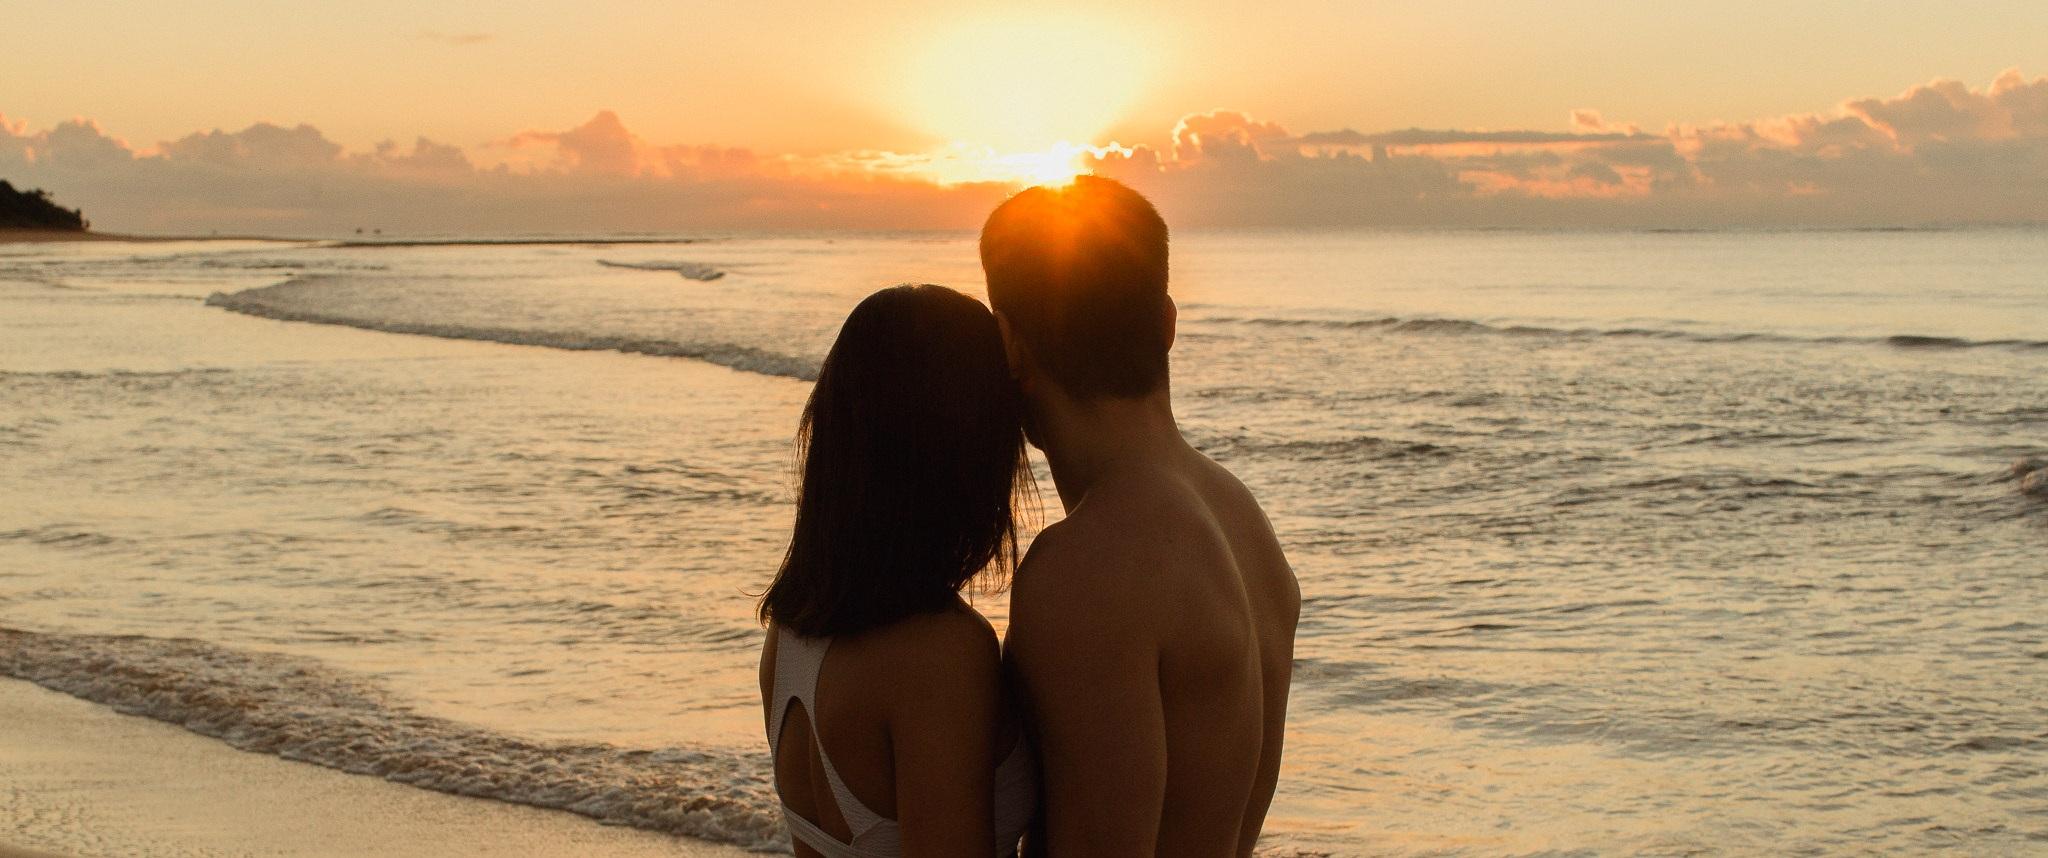 ensaio-pre-wedding-praia-landerson-viana-fotografia-casamento-pegueiobouquet-65.jpg